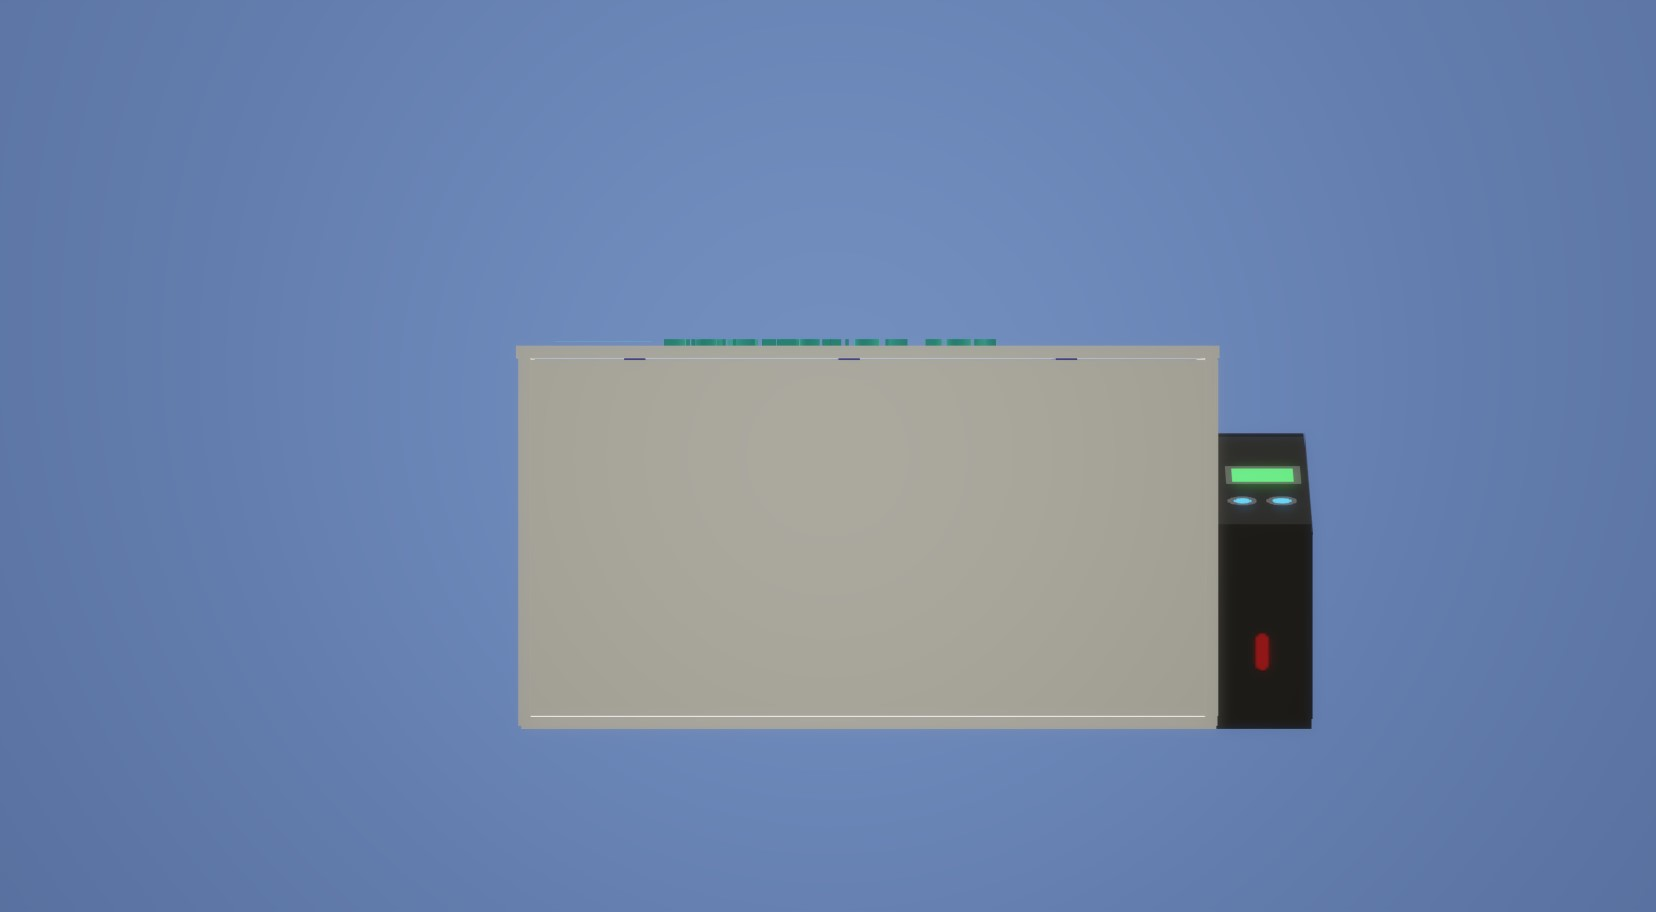 arduino uv sterilizer nevon